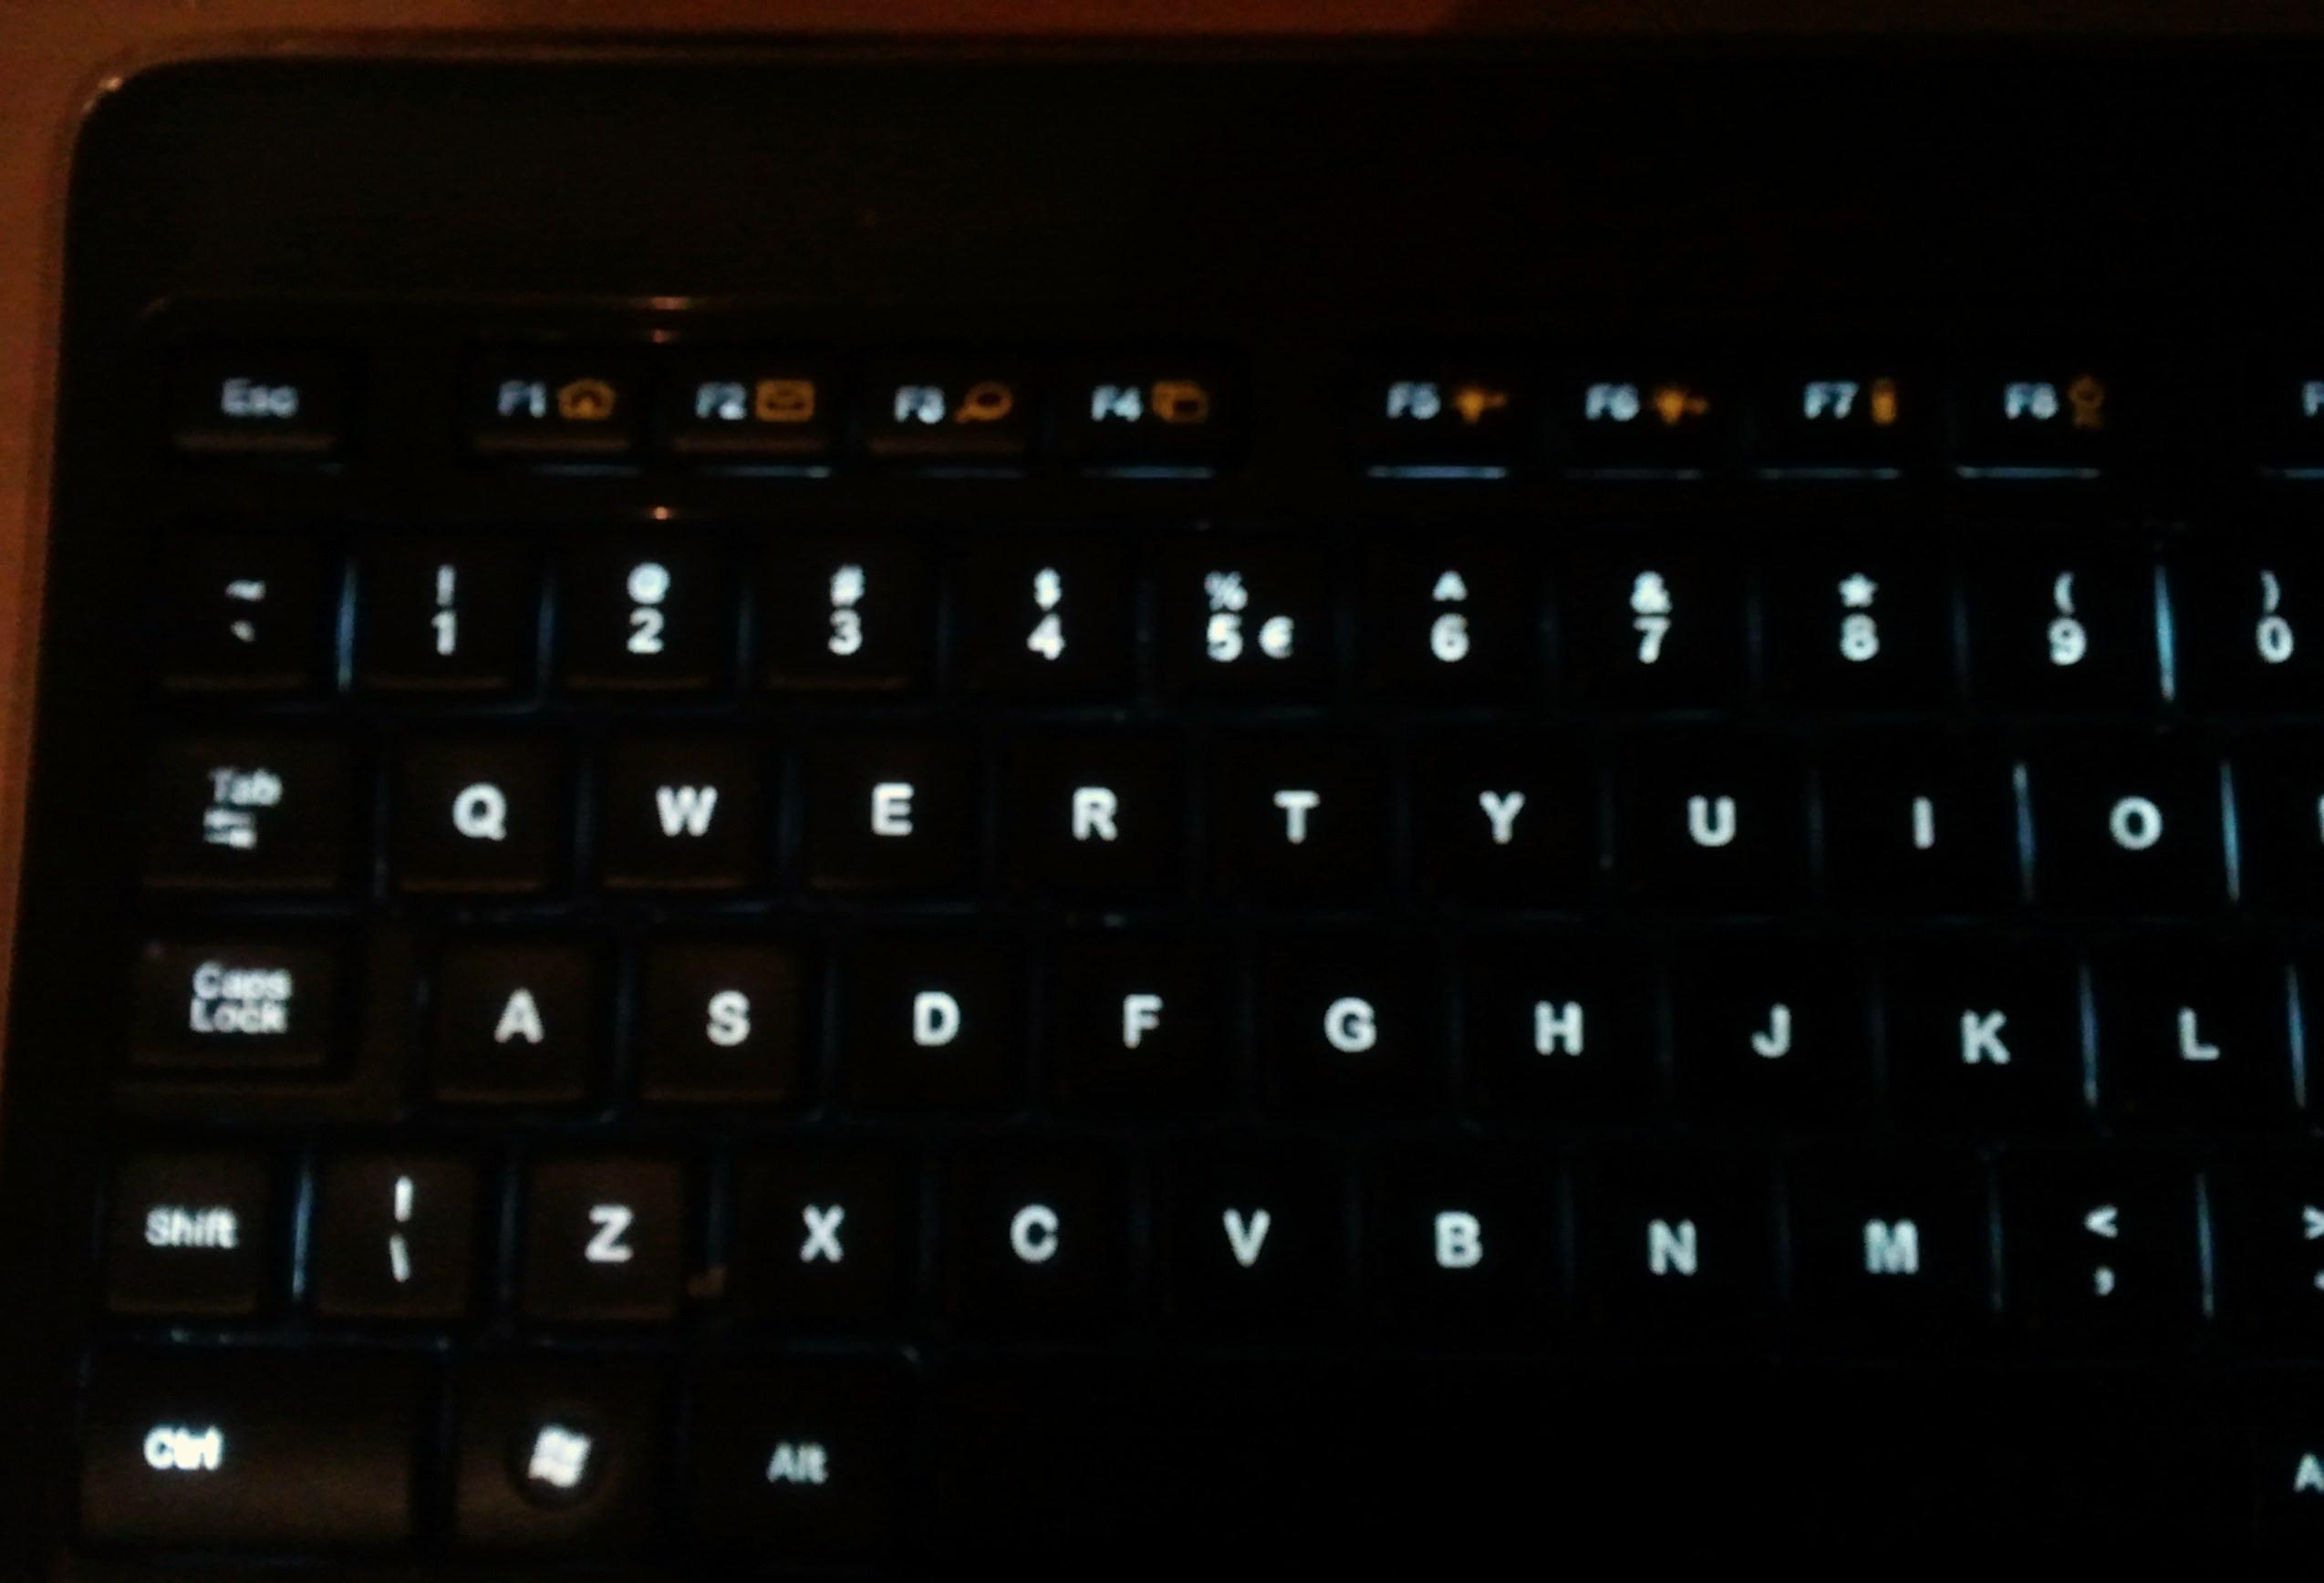 Toetsenbord Met Licht : Reviews over logitech k illuminated draadloos toetsenbord